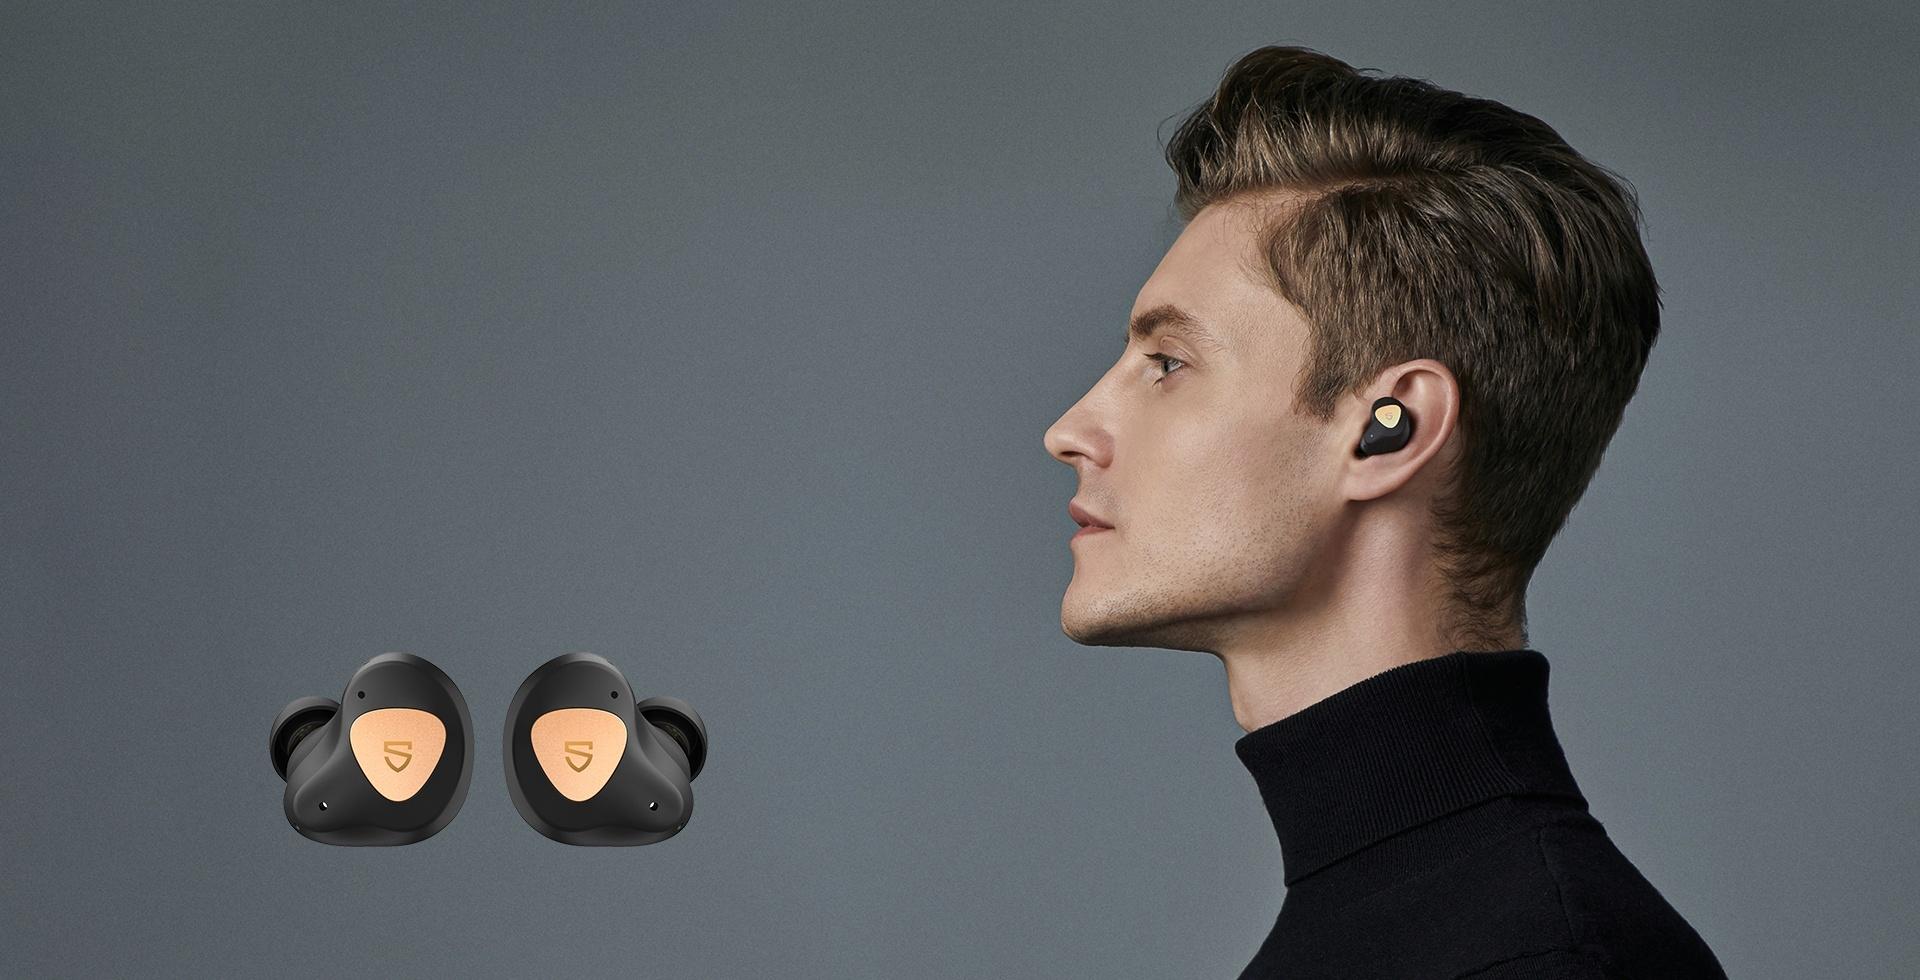 Tai_Nghe_True_Wireless_Earbuds_SOUNDPEATS_Truengine_3_SE_Bluetooth_V5_0_(3se_1).jpg